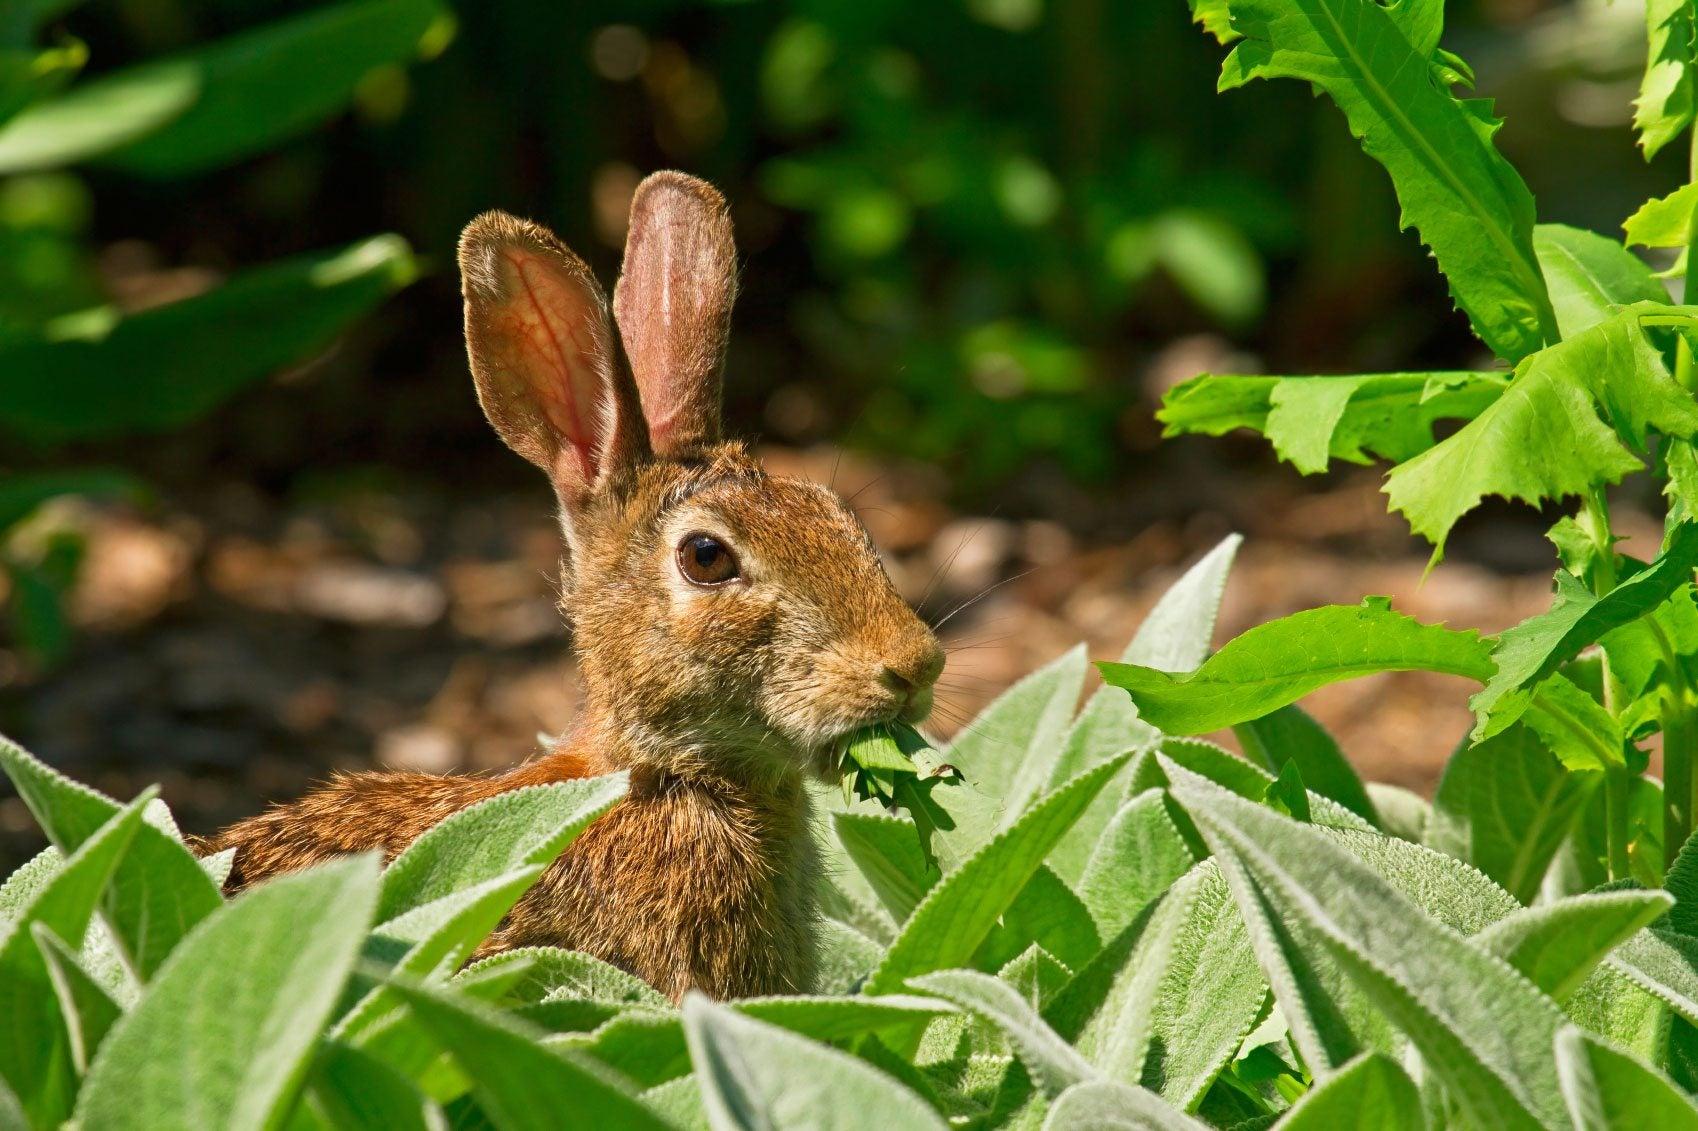 Rabbit Resistant Plants - What Are Some Plants Rabbits Won\'t Eat